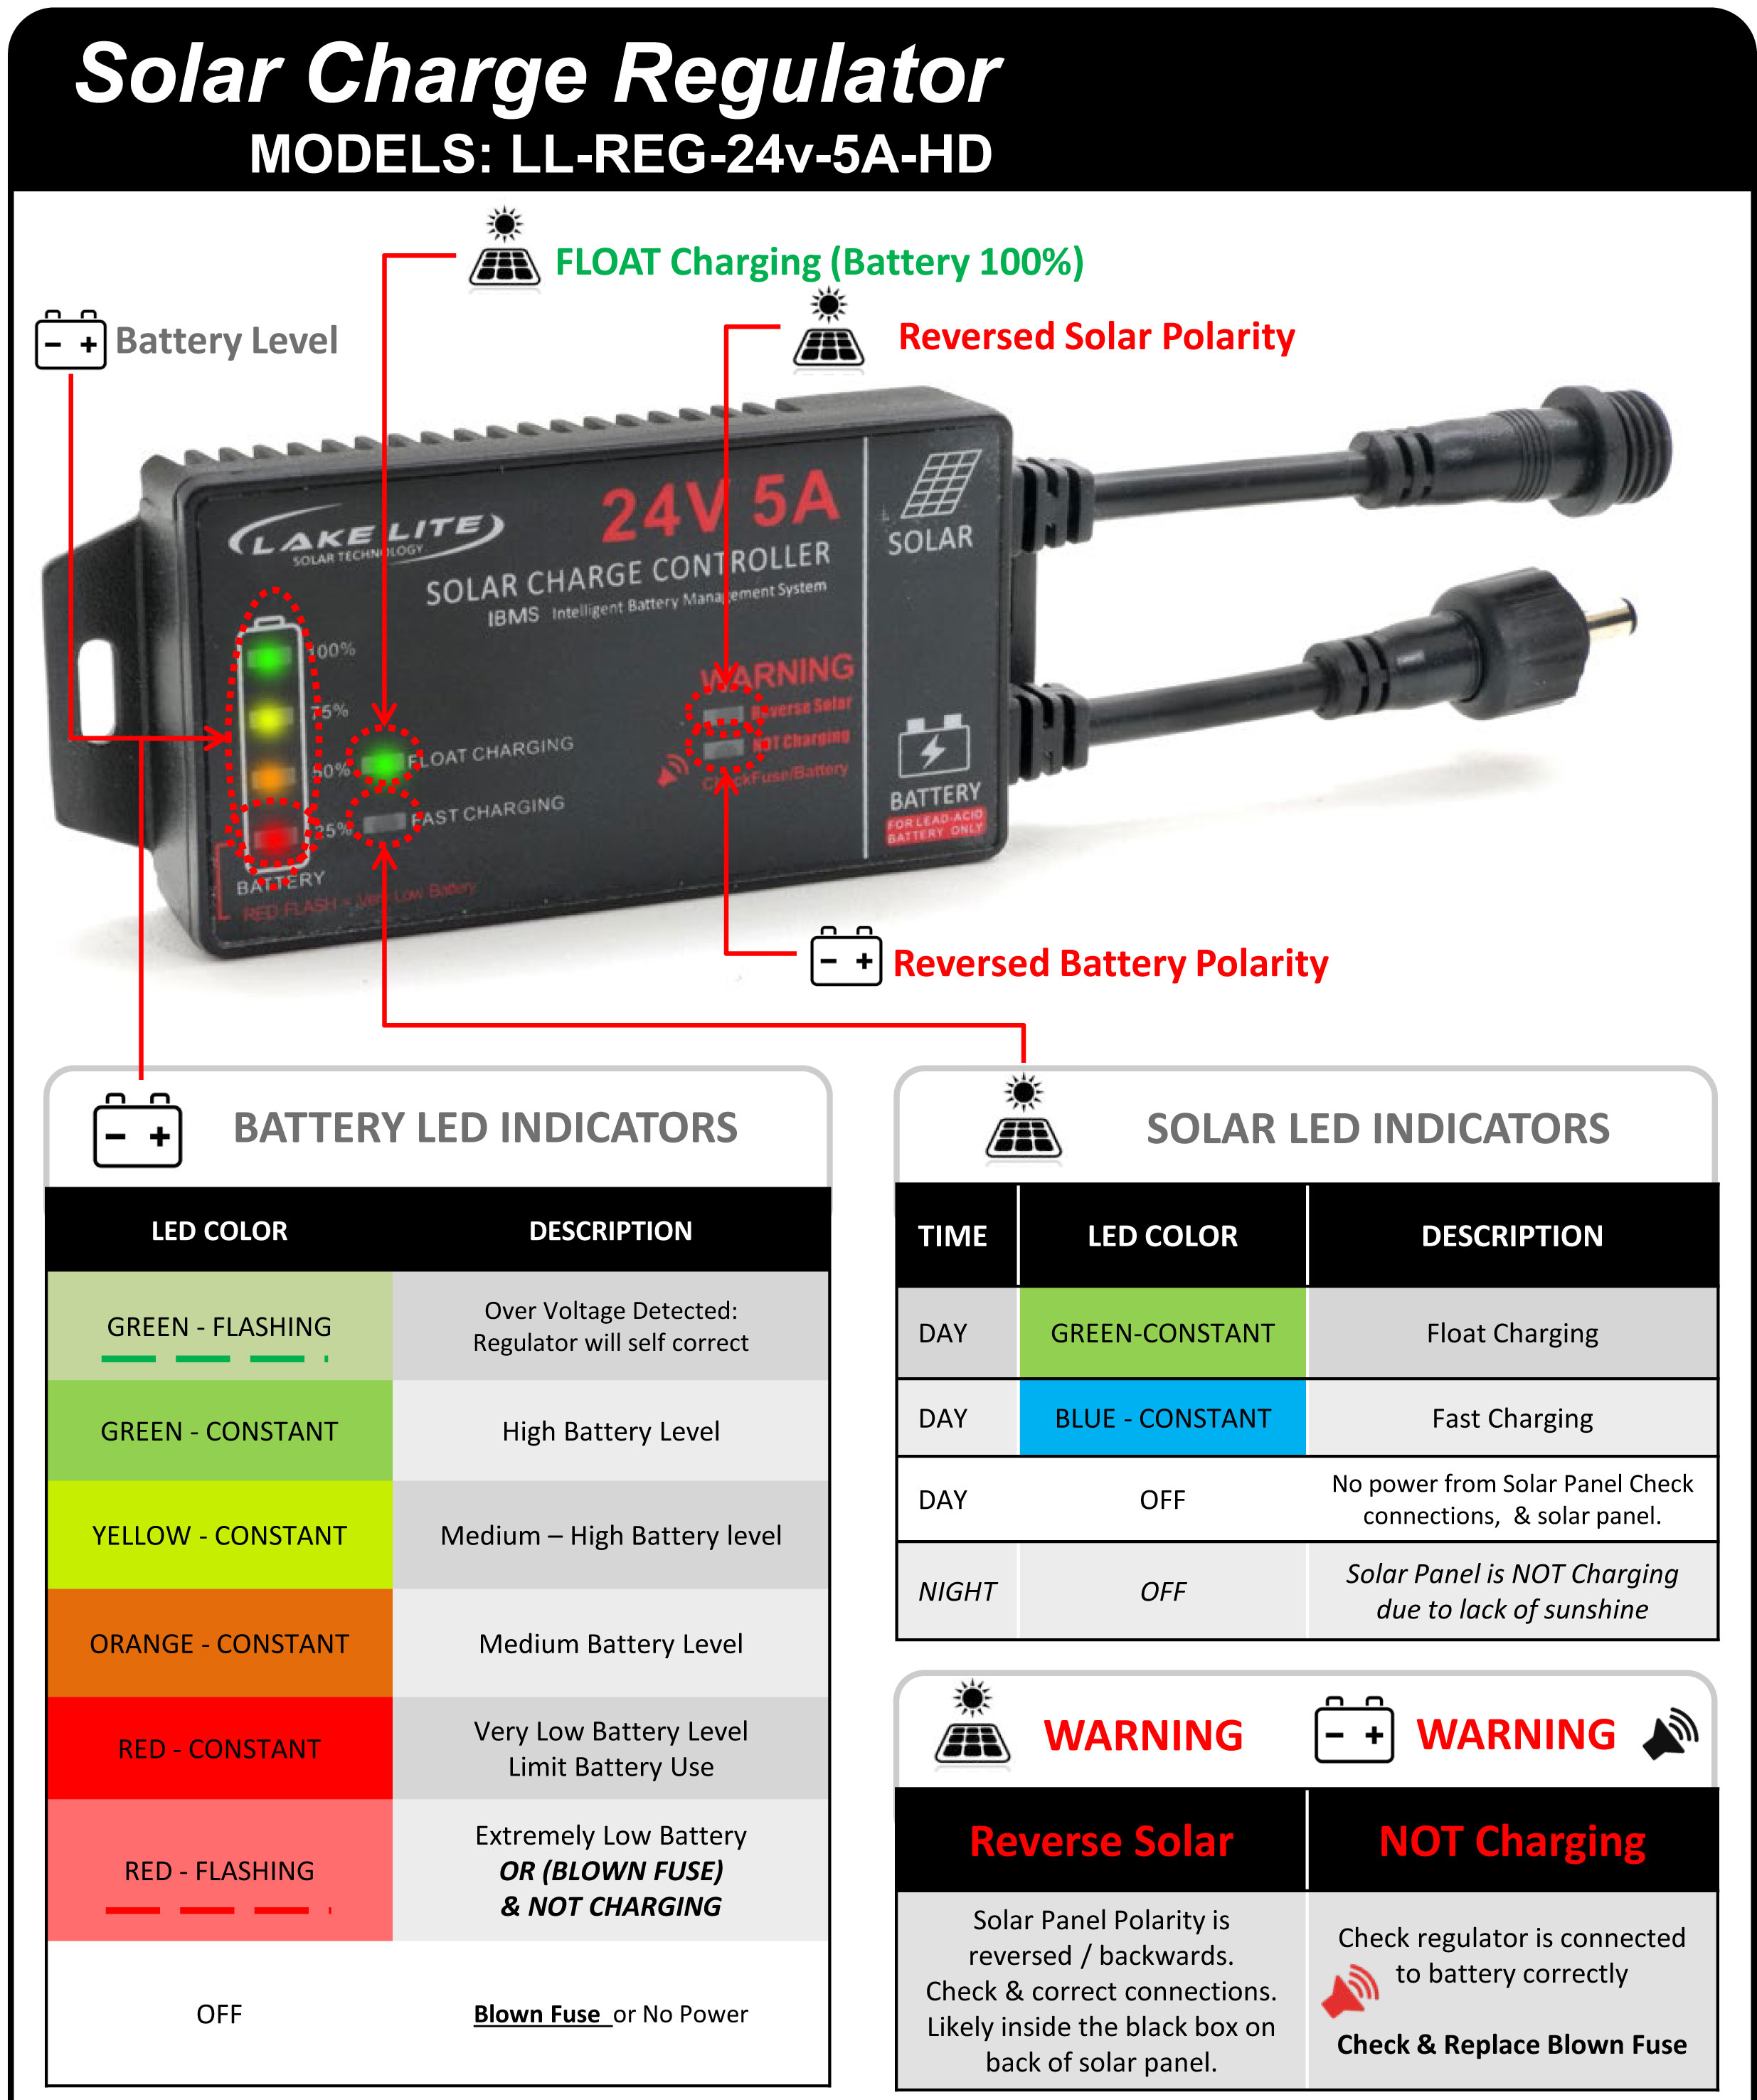 HD-charge-reg-instructions